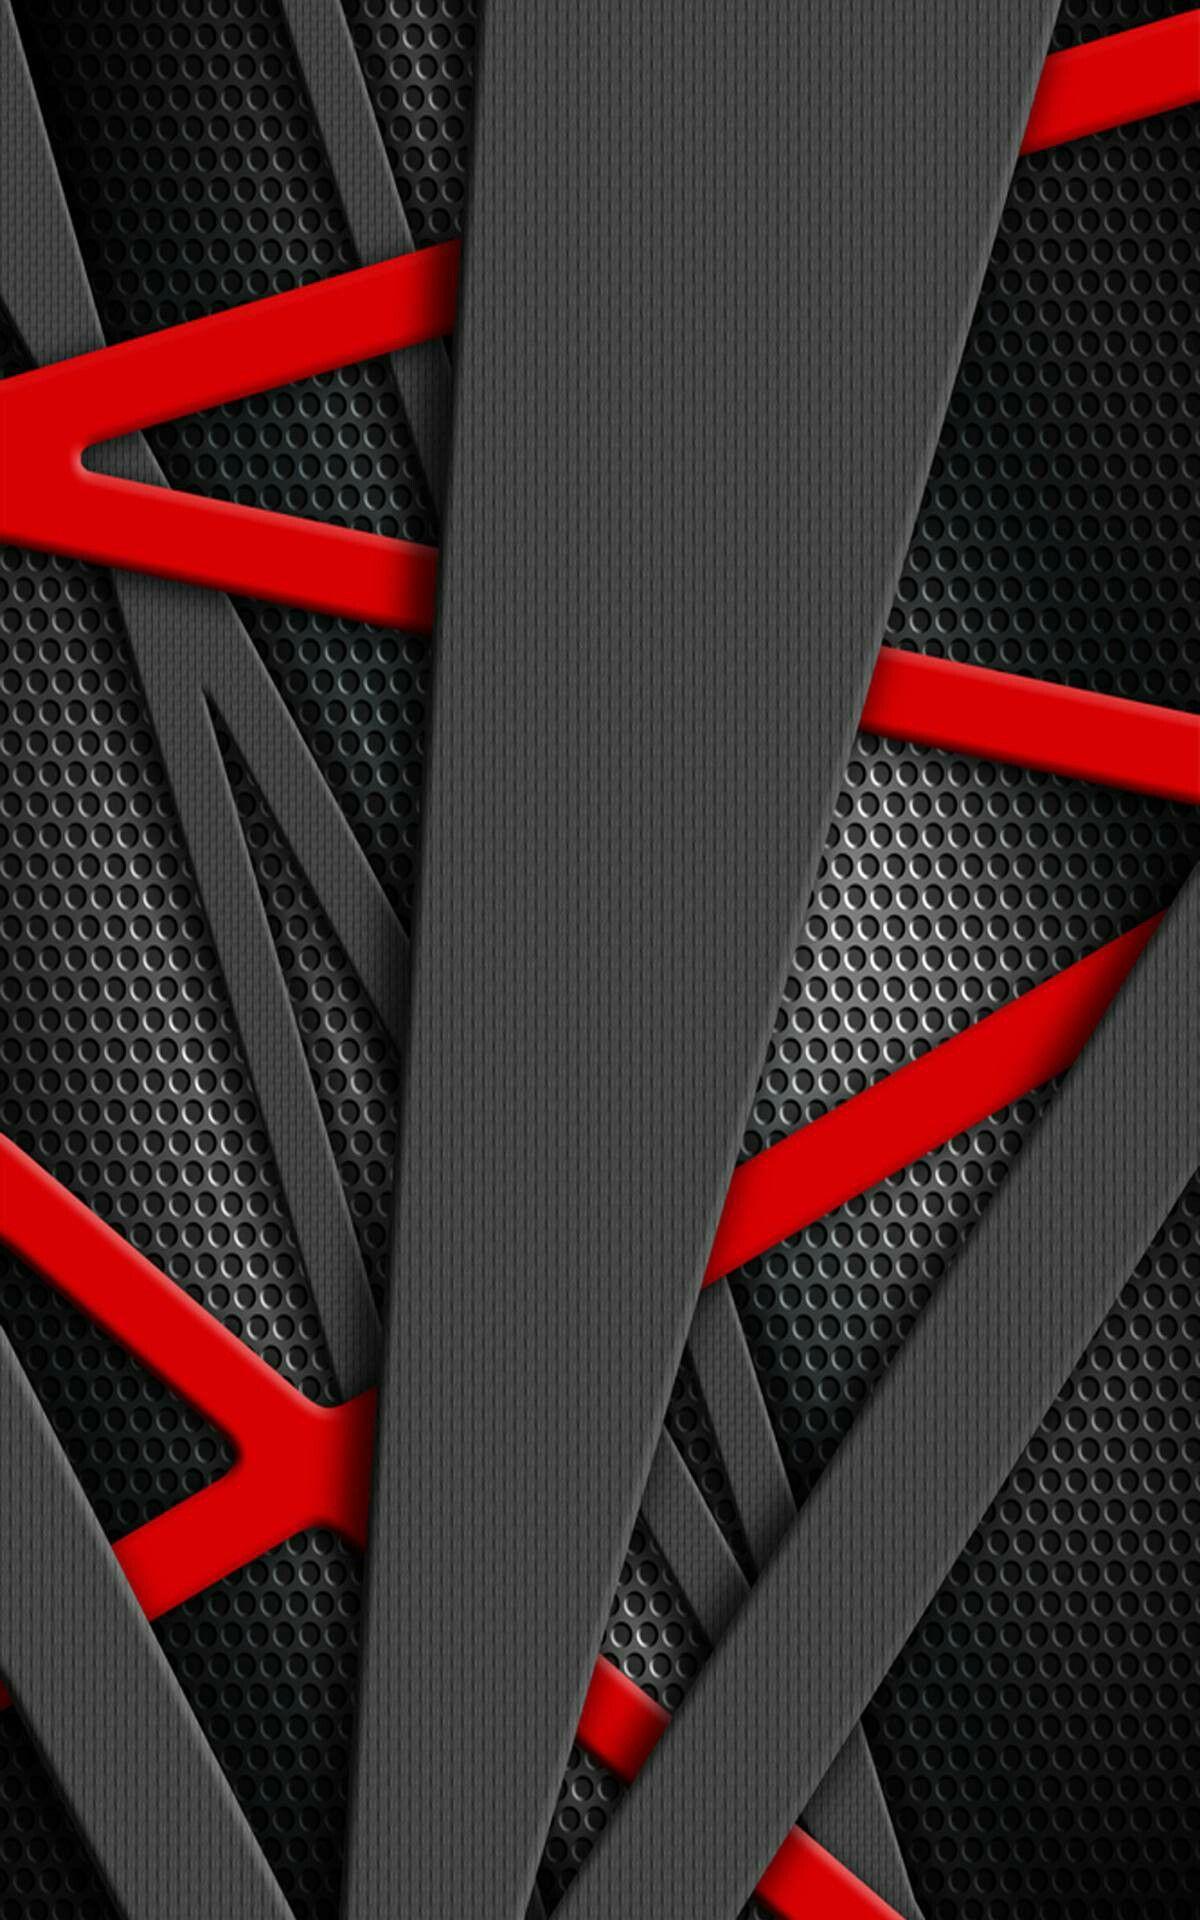 Pin Oleh Mohameddarweesh Di Tlo Czarne I Czerwone Background Black And Red Wallpaper 3d Wallpaper Ponsel Seni Fotografi